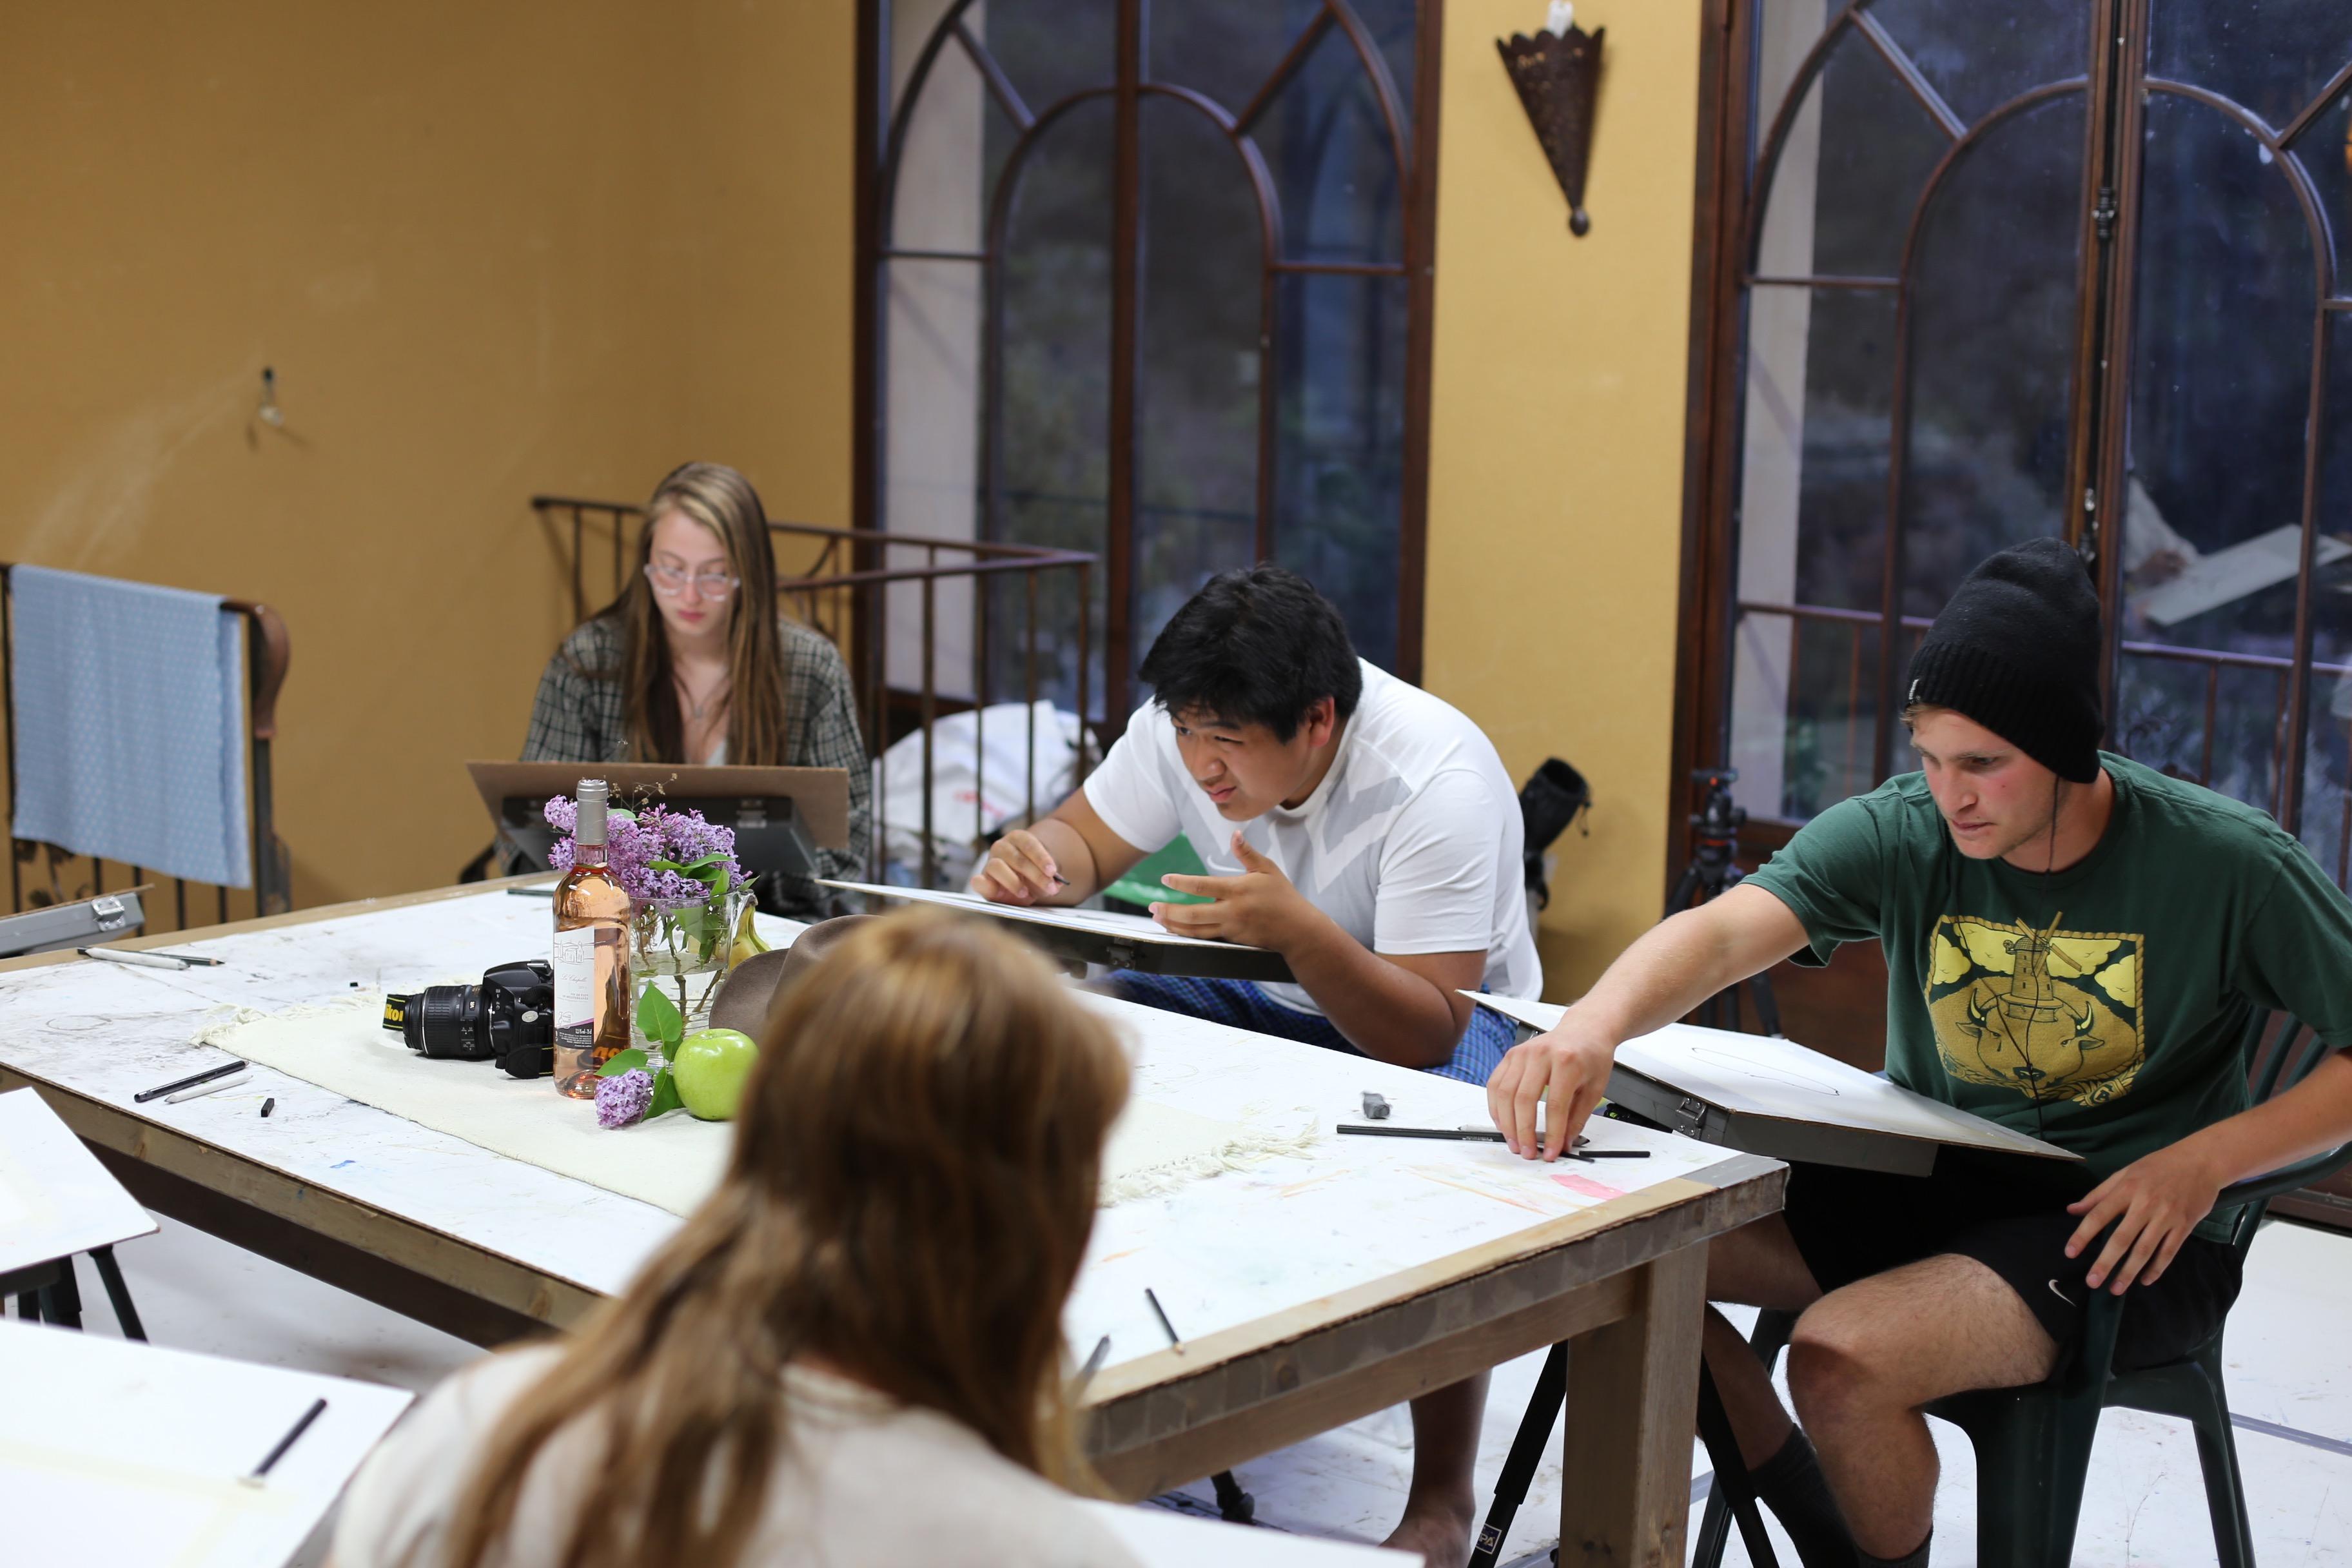 european art classroom aix en provence france proctor academy